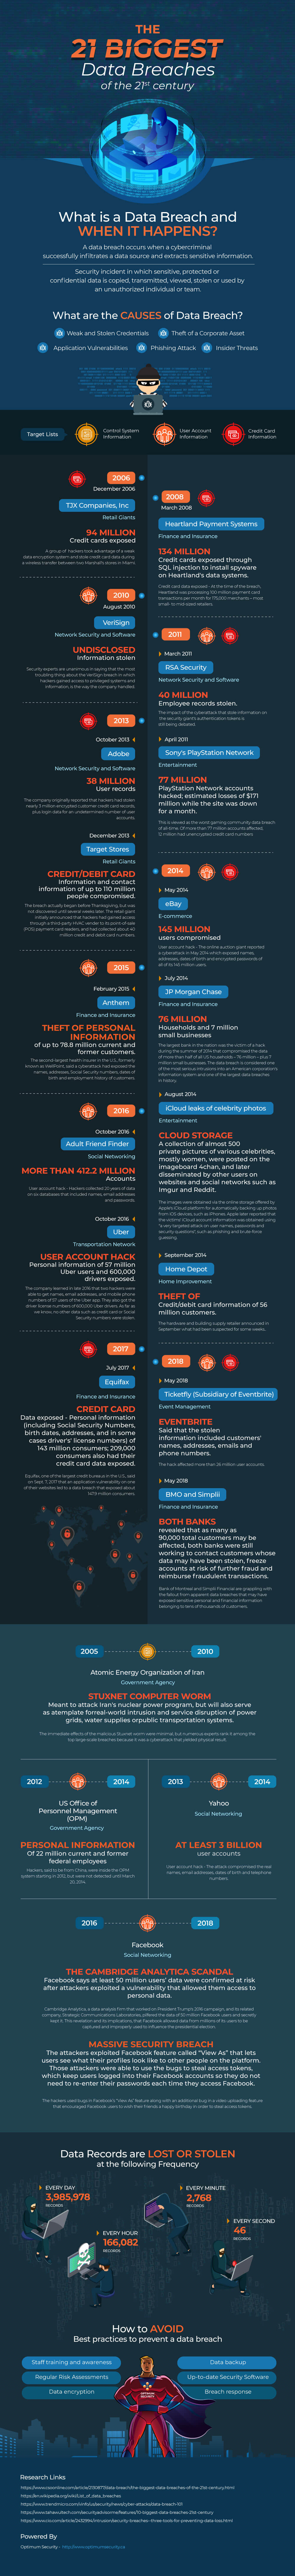 Infographic Courtesy of:  Optimum Security